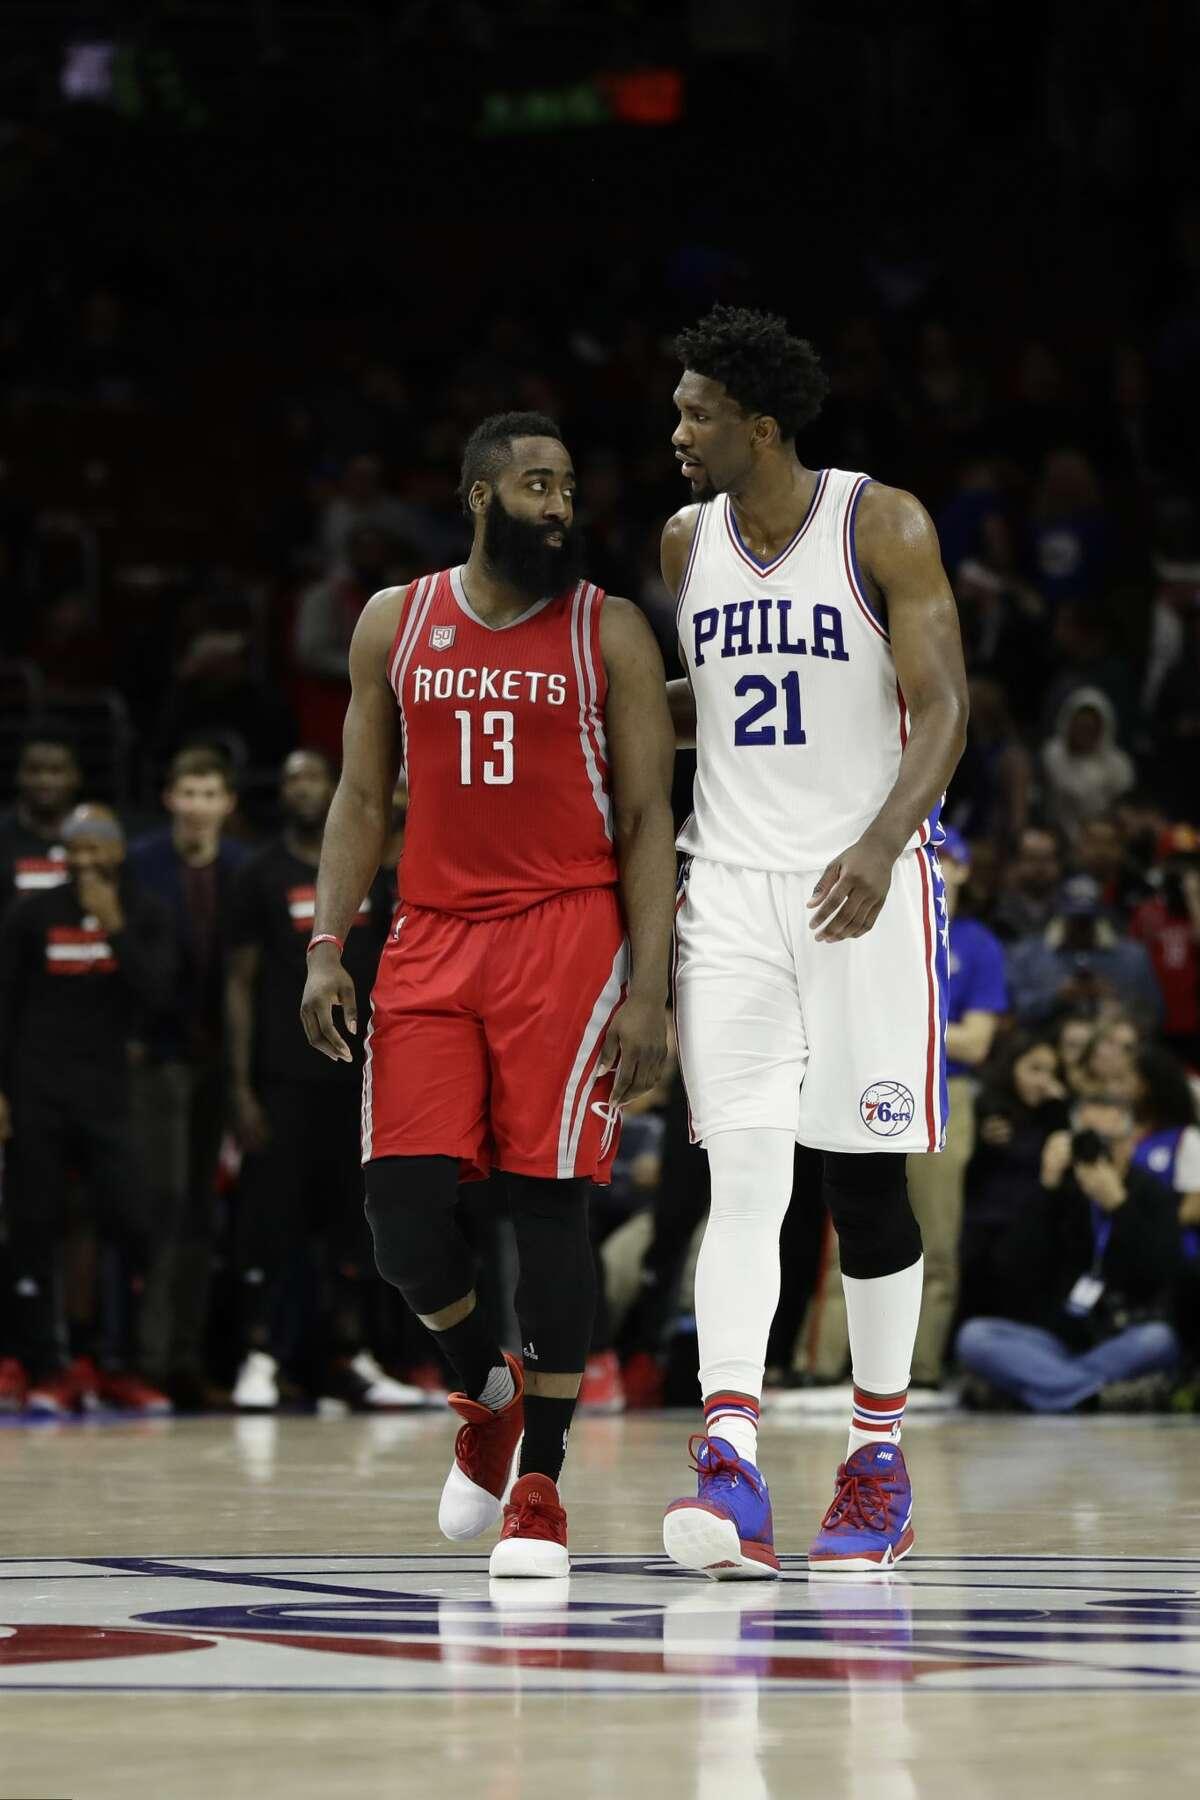 Houston Rockets' James Harden, left, and Philadelphia 76ers' Joel Embiid walk down the court during an NBA basketball game, Friday, Jan. 27, 2017, in Philadelphia. (AP Photo/Matt Slocum)